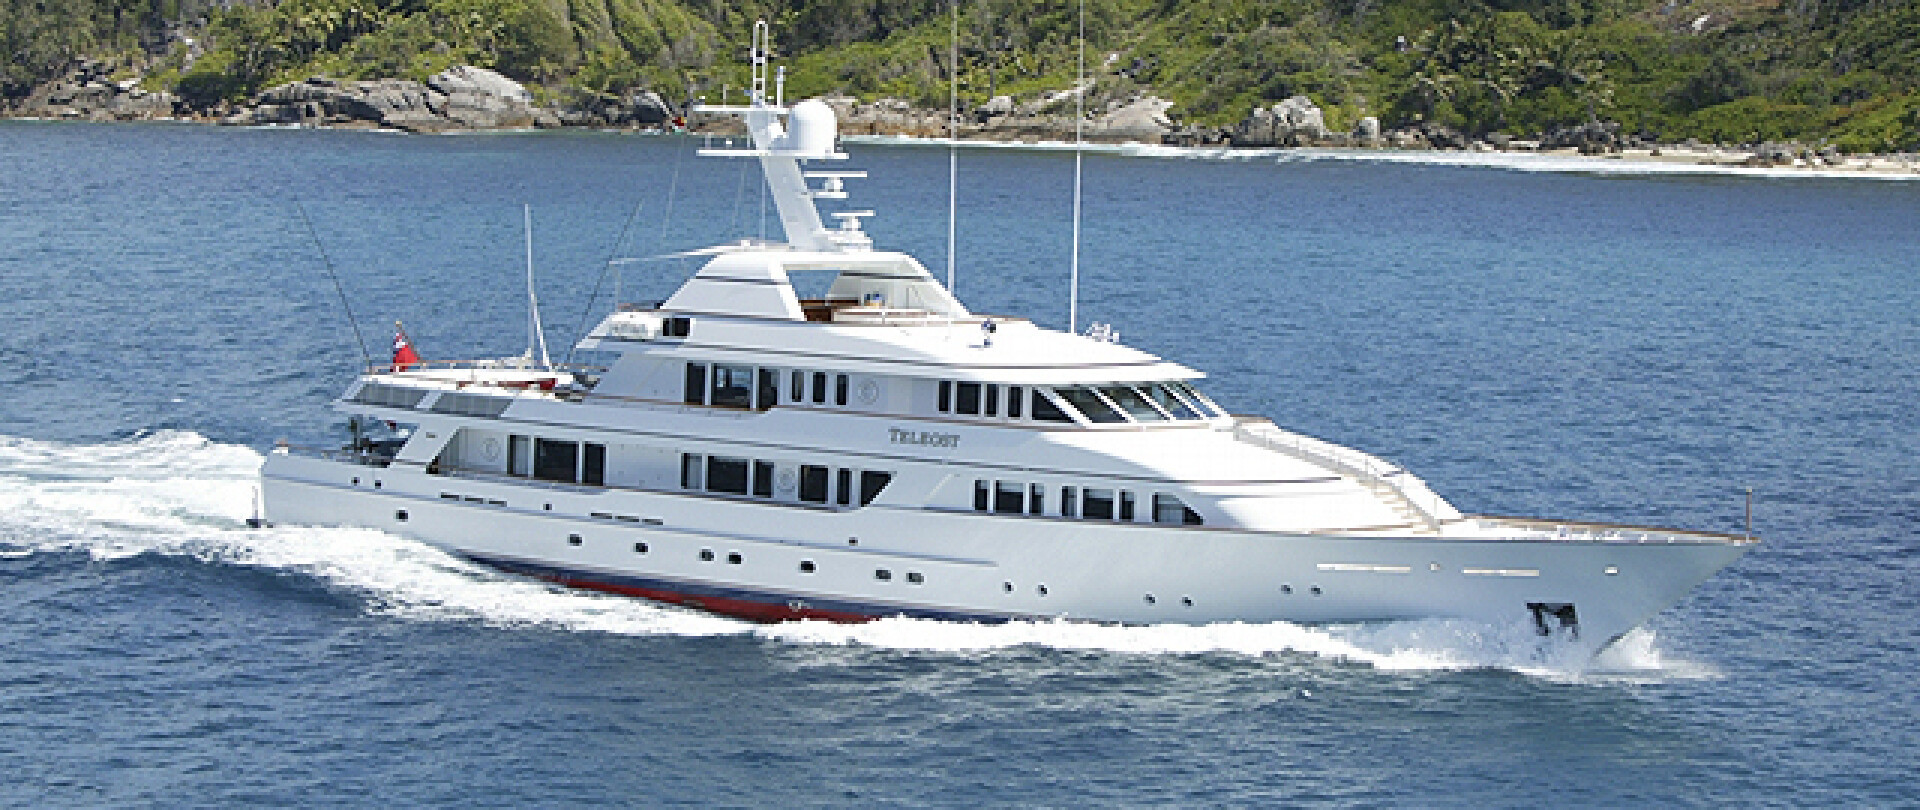 Edmiston Attending the 2014 Antigua Charter Yacht Show photo 3